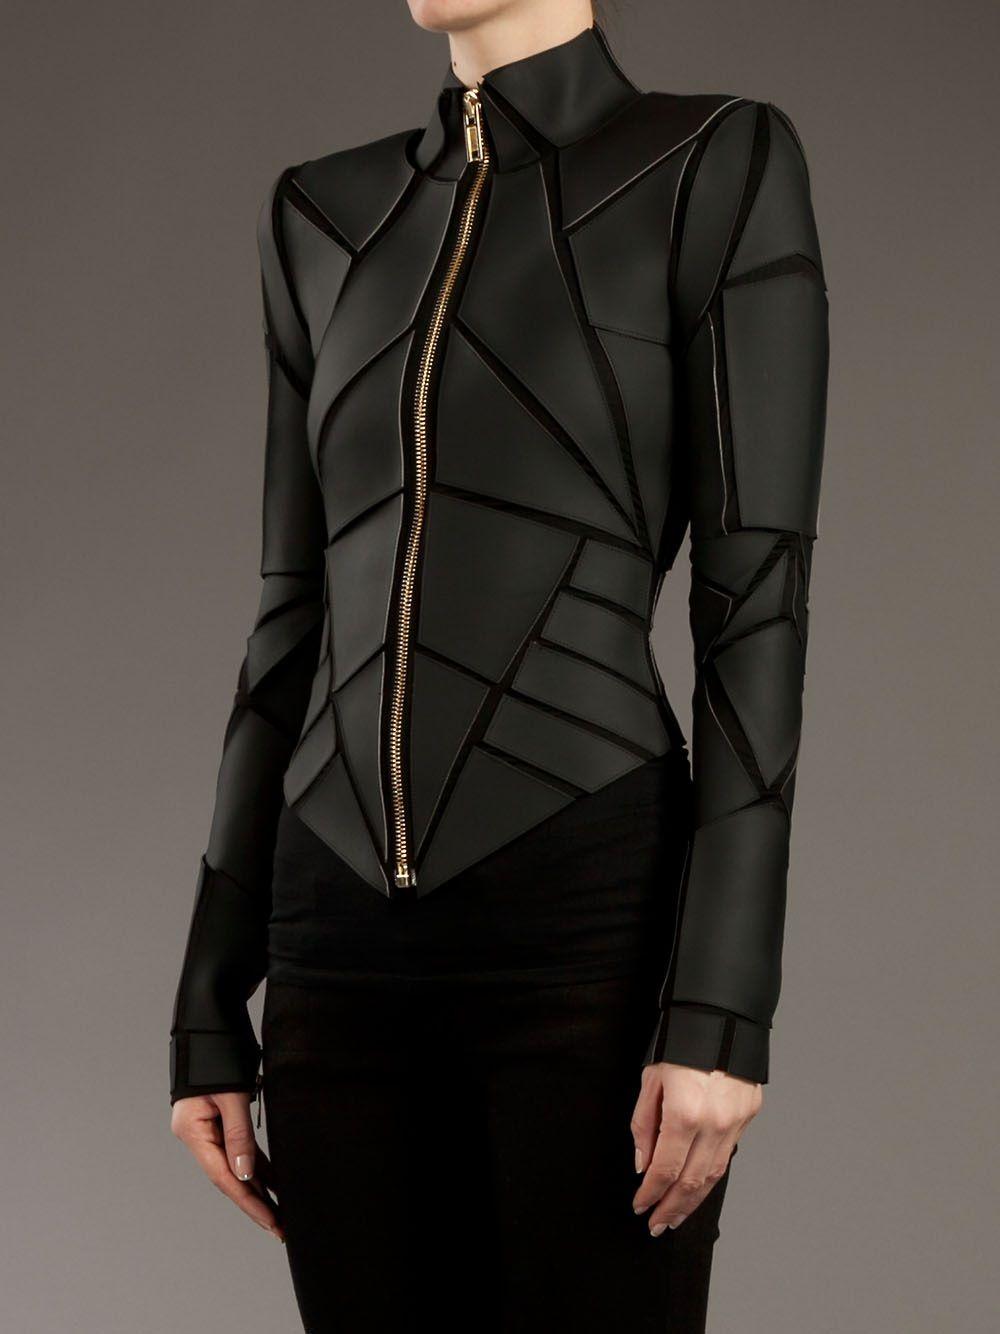 98d16441ddf212 Gareth Pugh - Geometric Panelled Leather Jacket